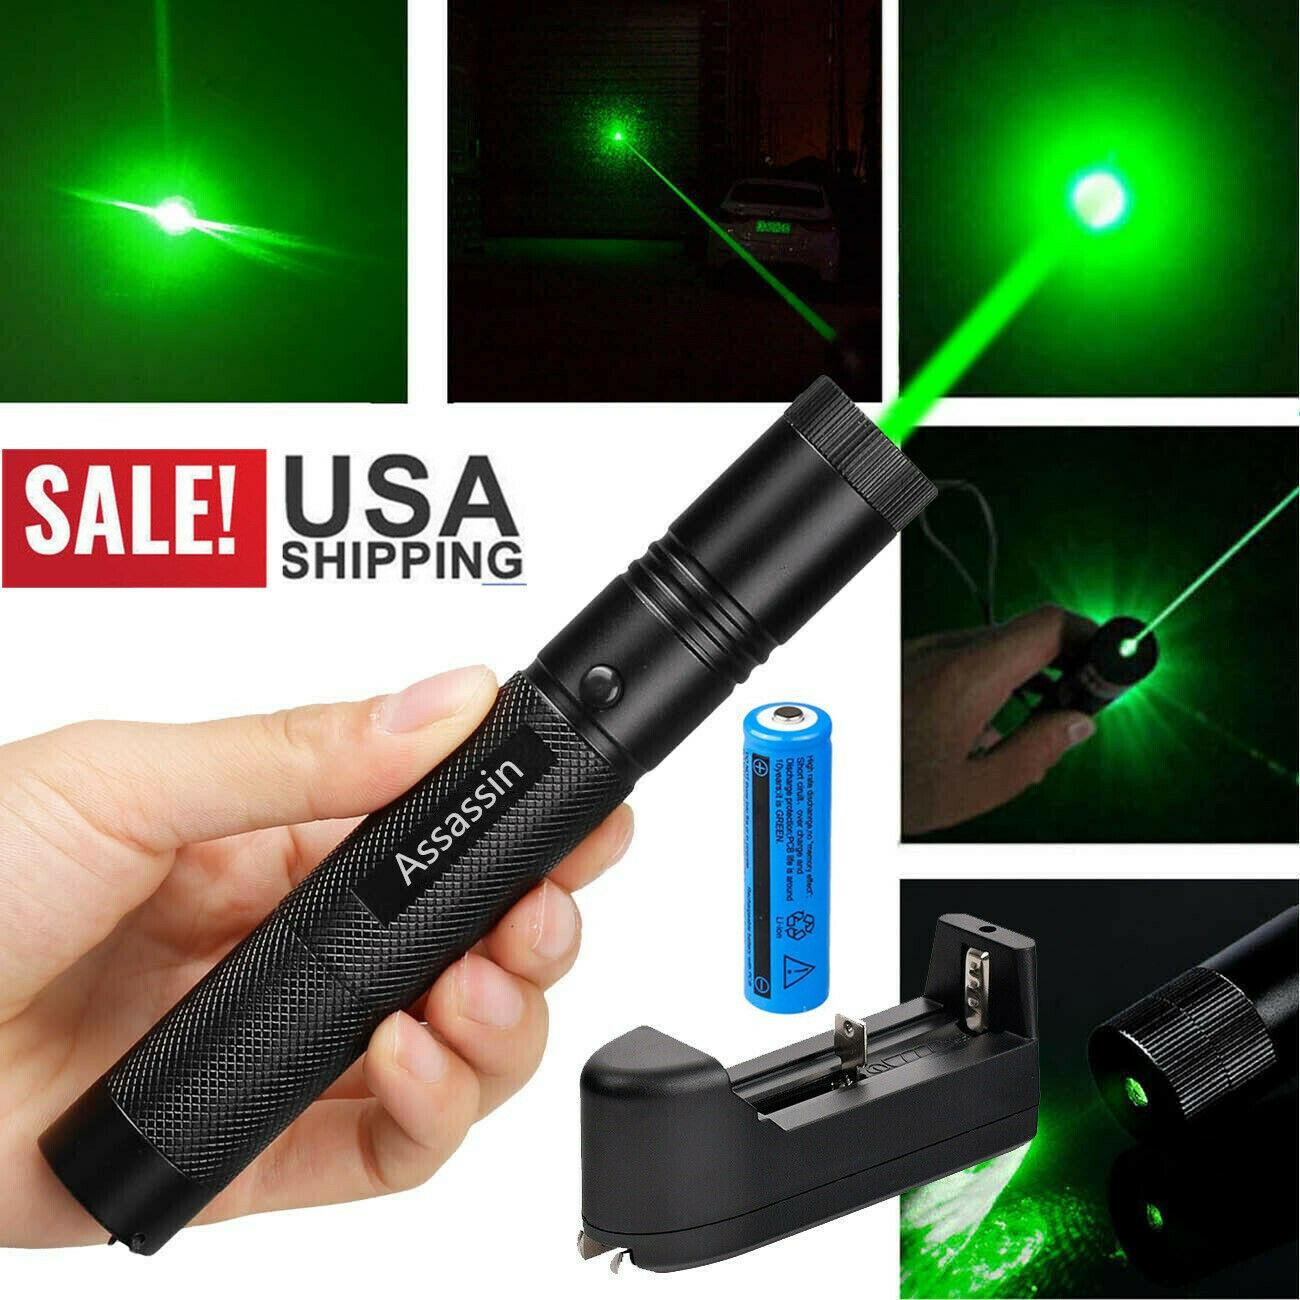 10 Miles Laser Pen Pointer Green Lights Lazer Light Adjustable Visble Lazer Lamp